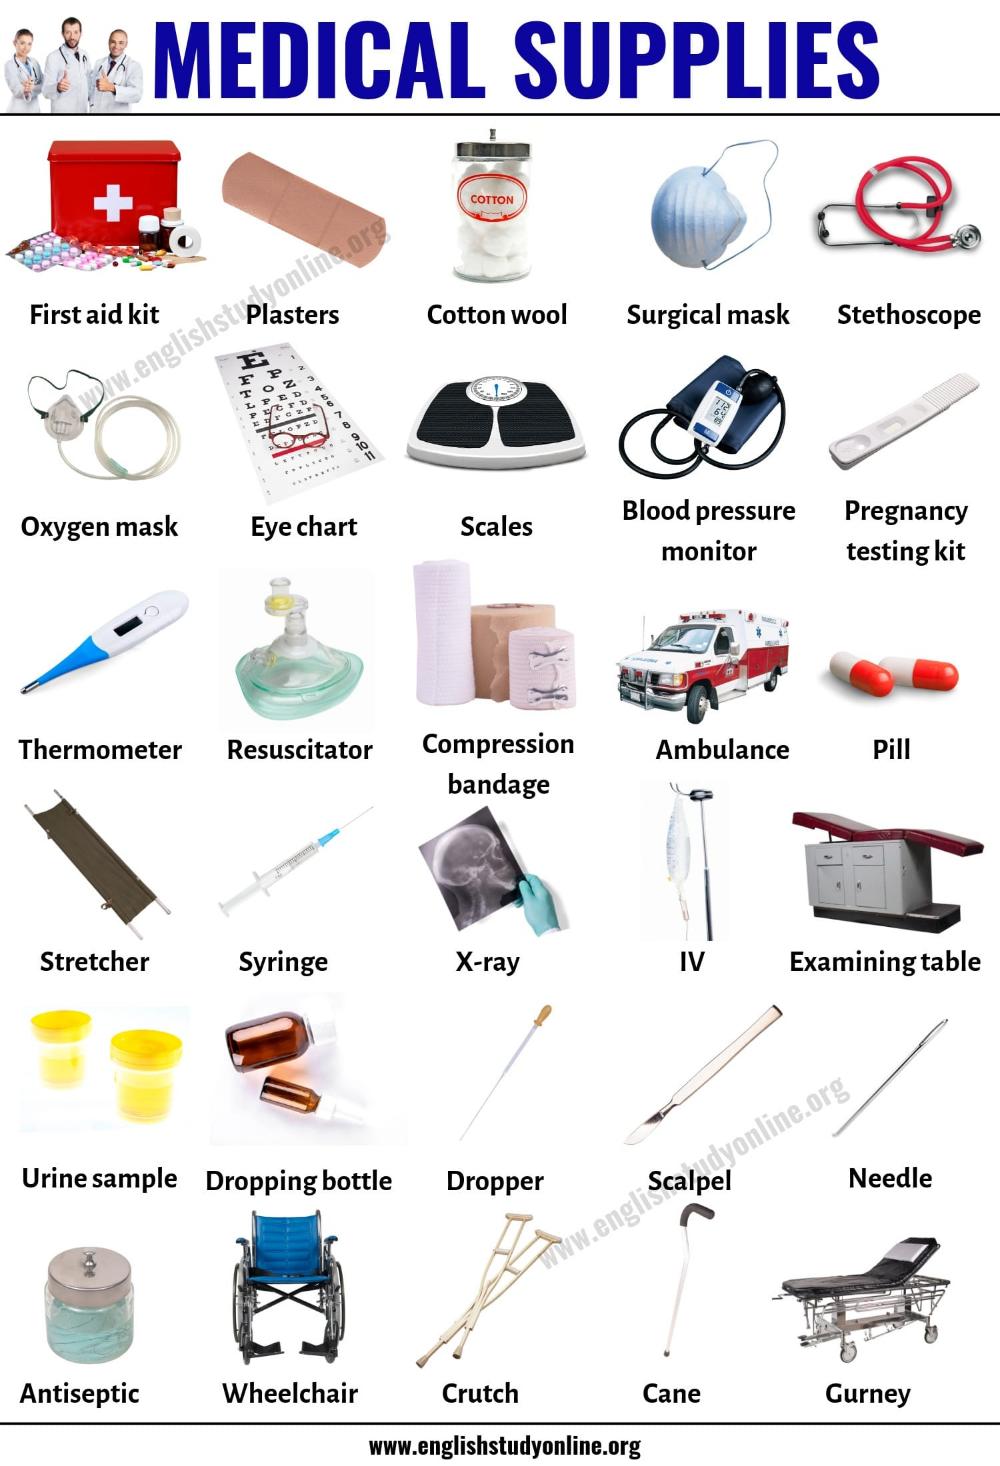 Sour Medical Supplies Home Medicalstudents Medicalsupplieschildren In 2020 English Study Medical Supplies English Vocabulary